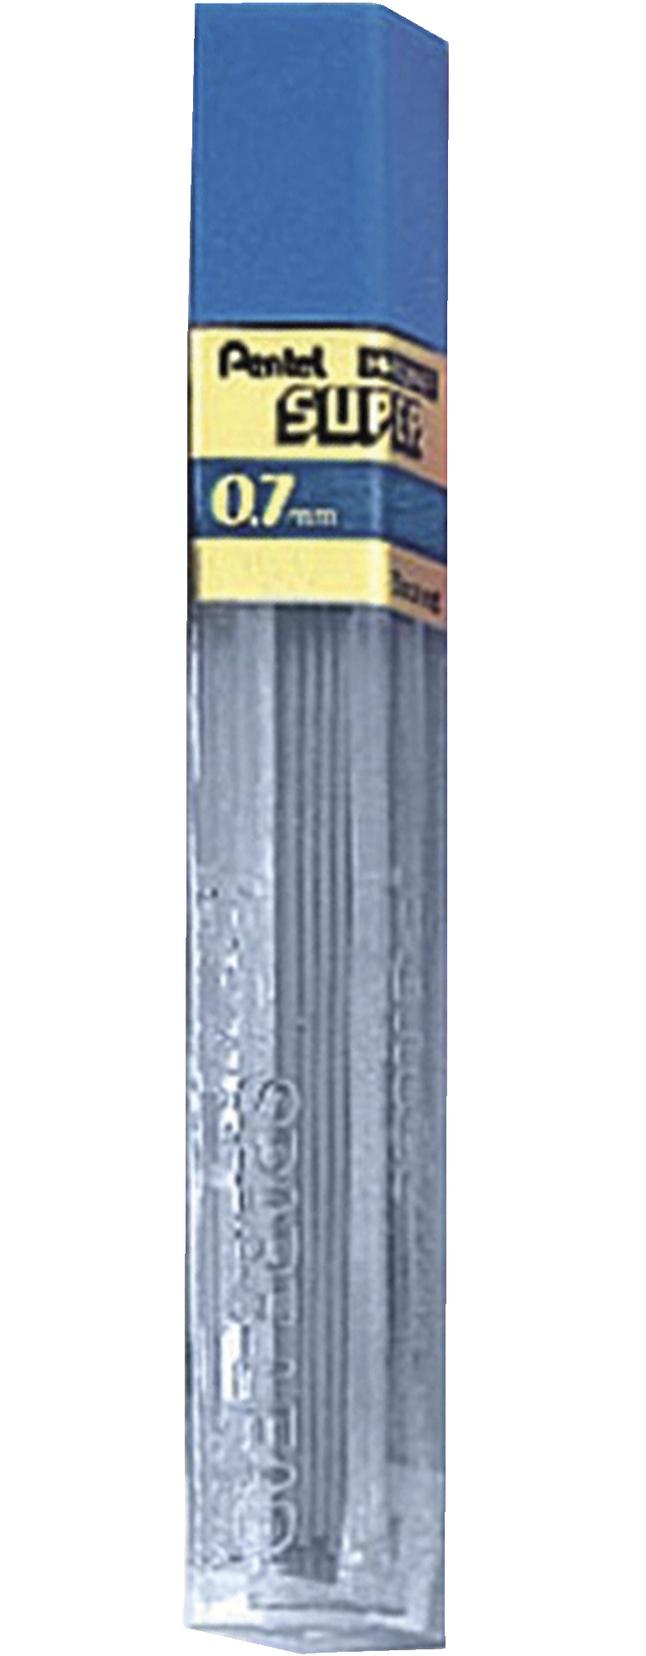 Mechanical Pencils, Item Number 1065189